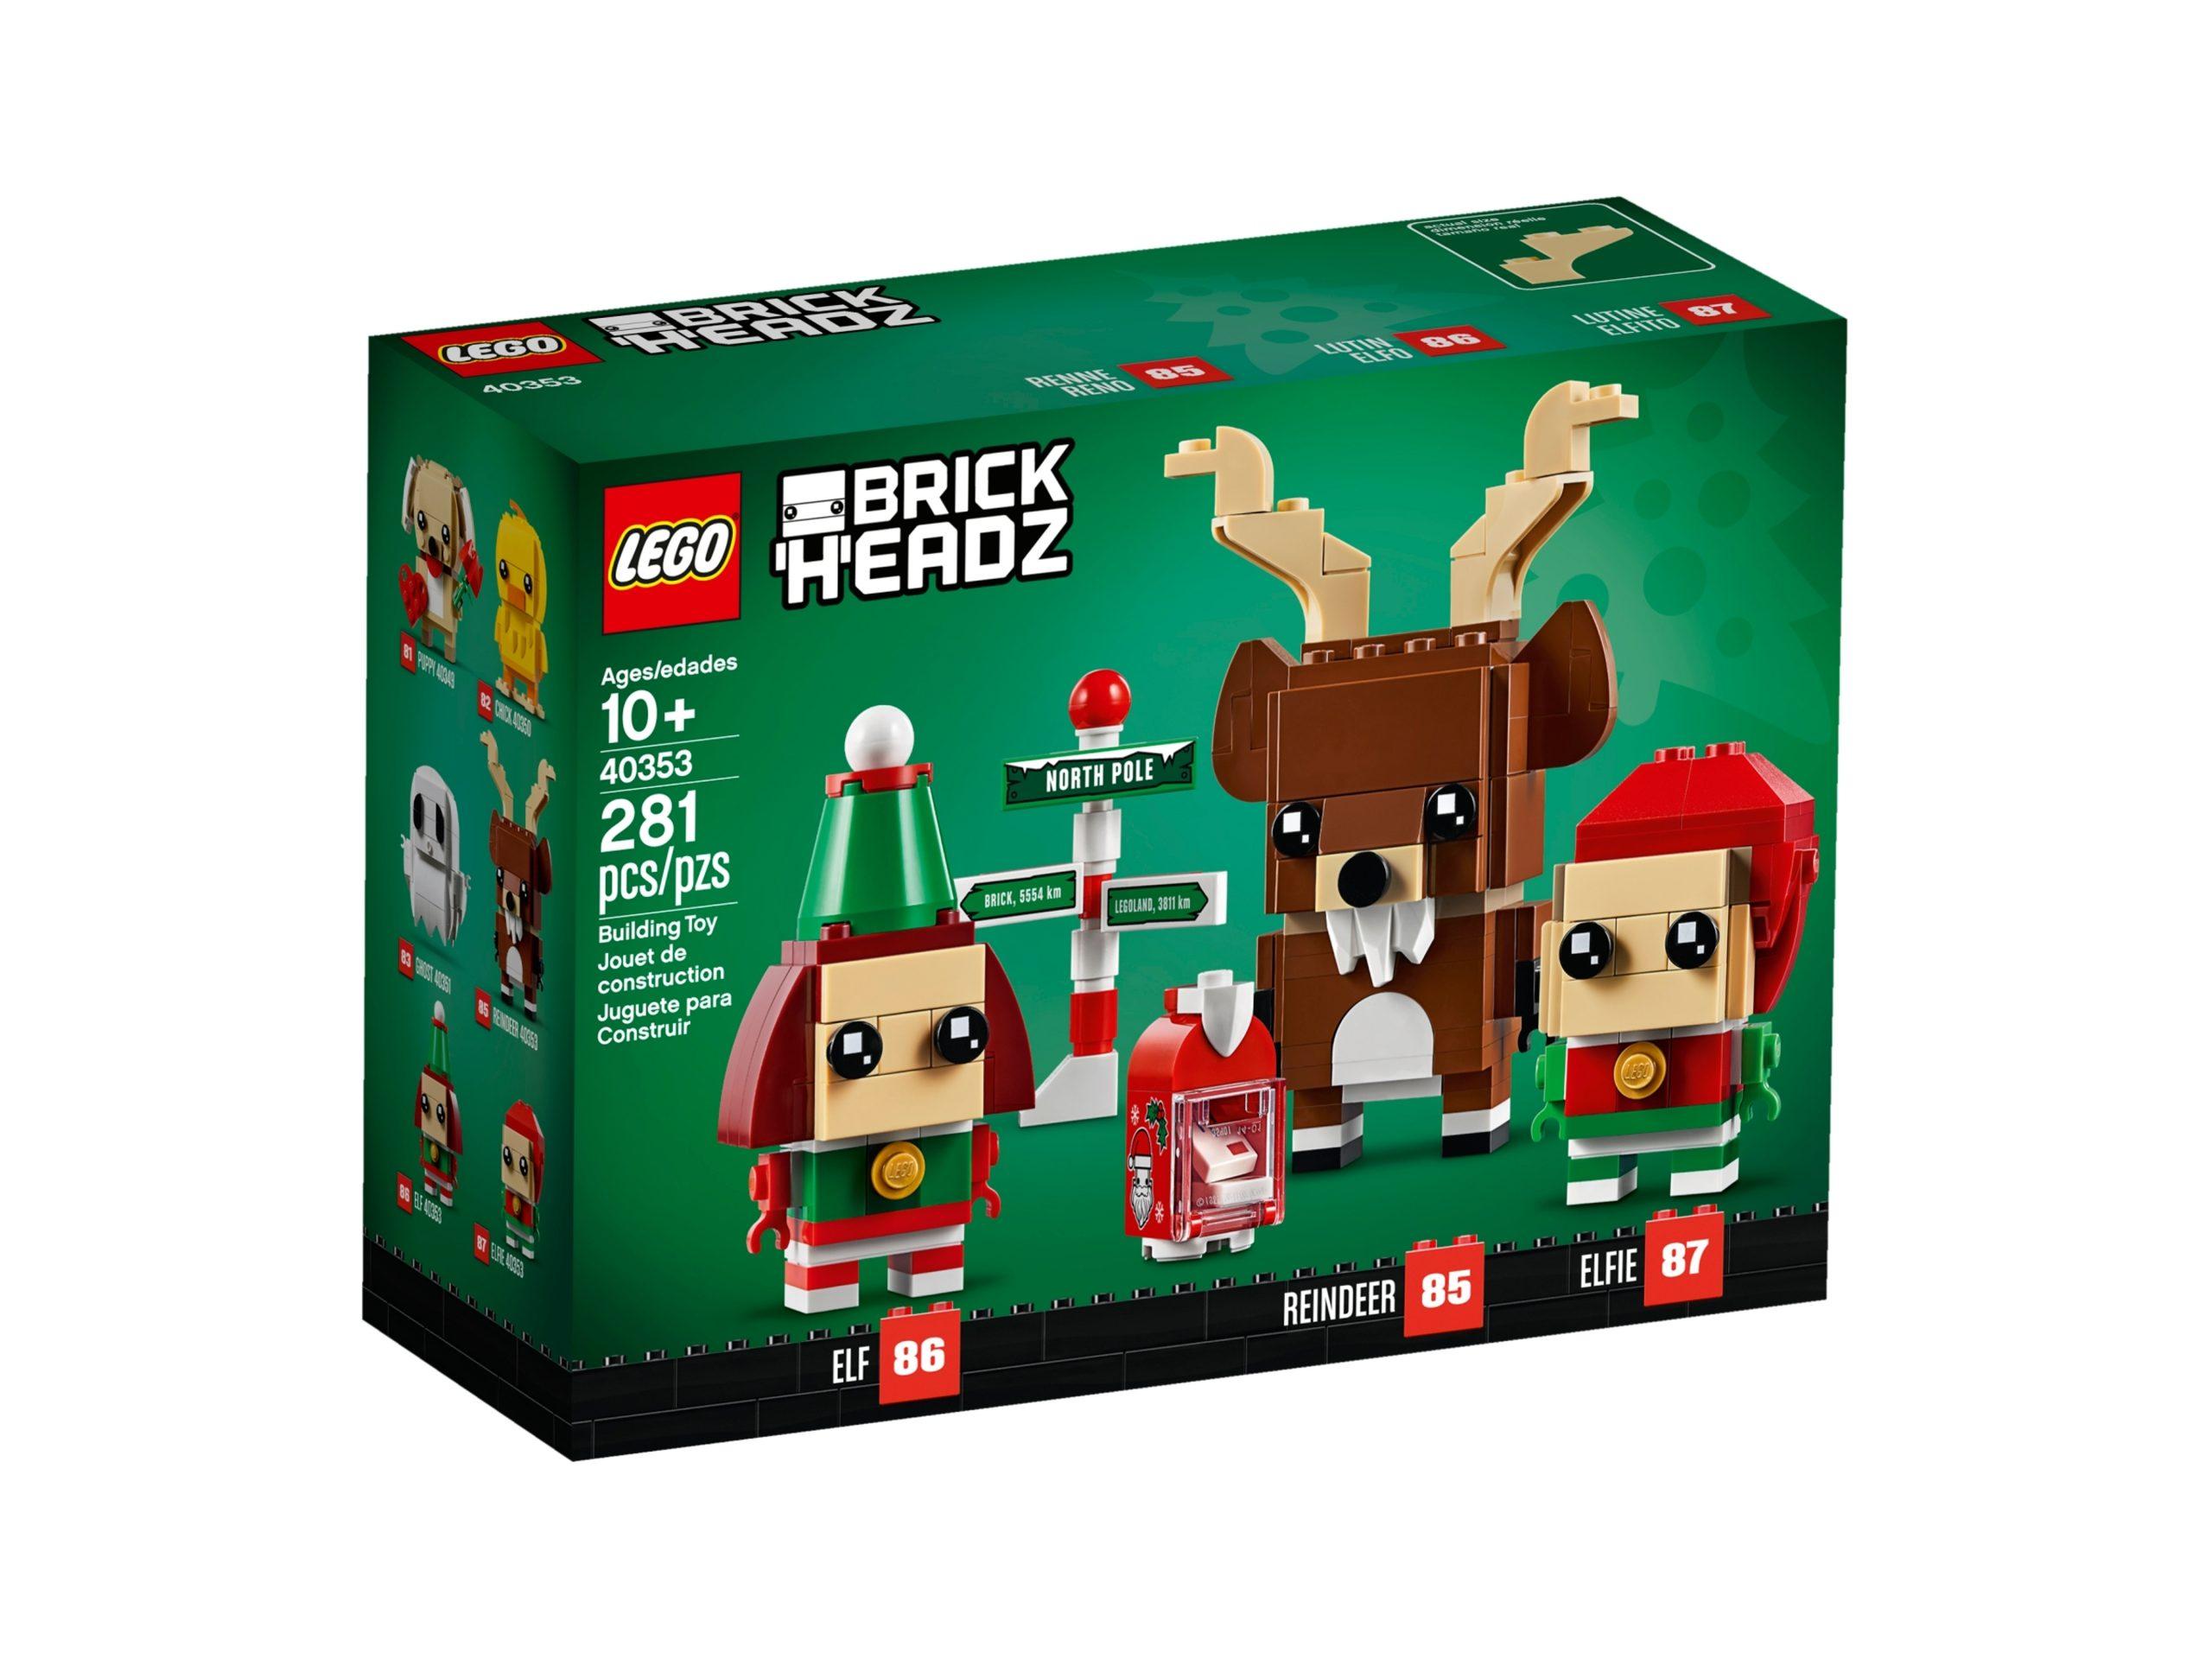 lego 40353 renna elfo ed elfa scaled